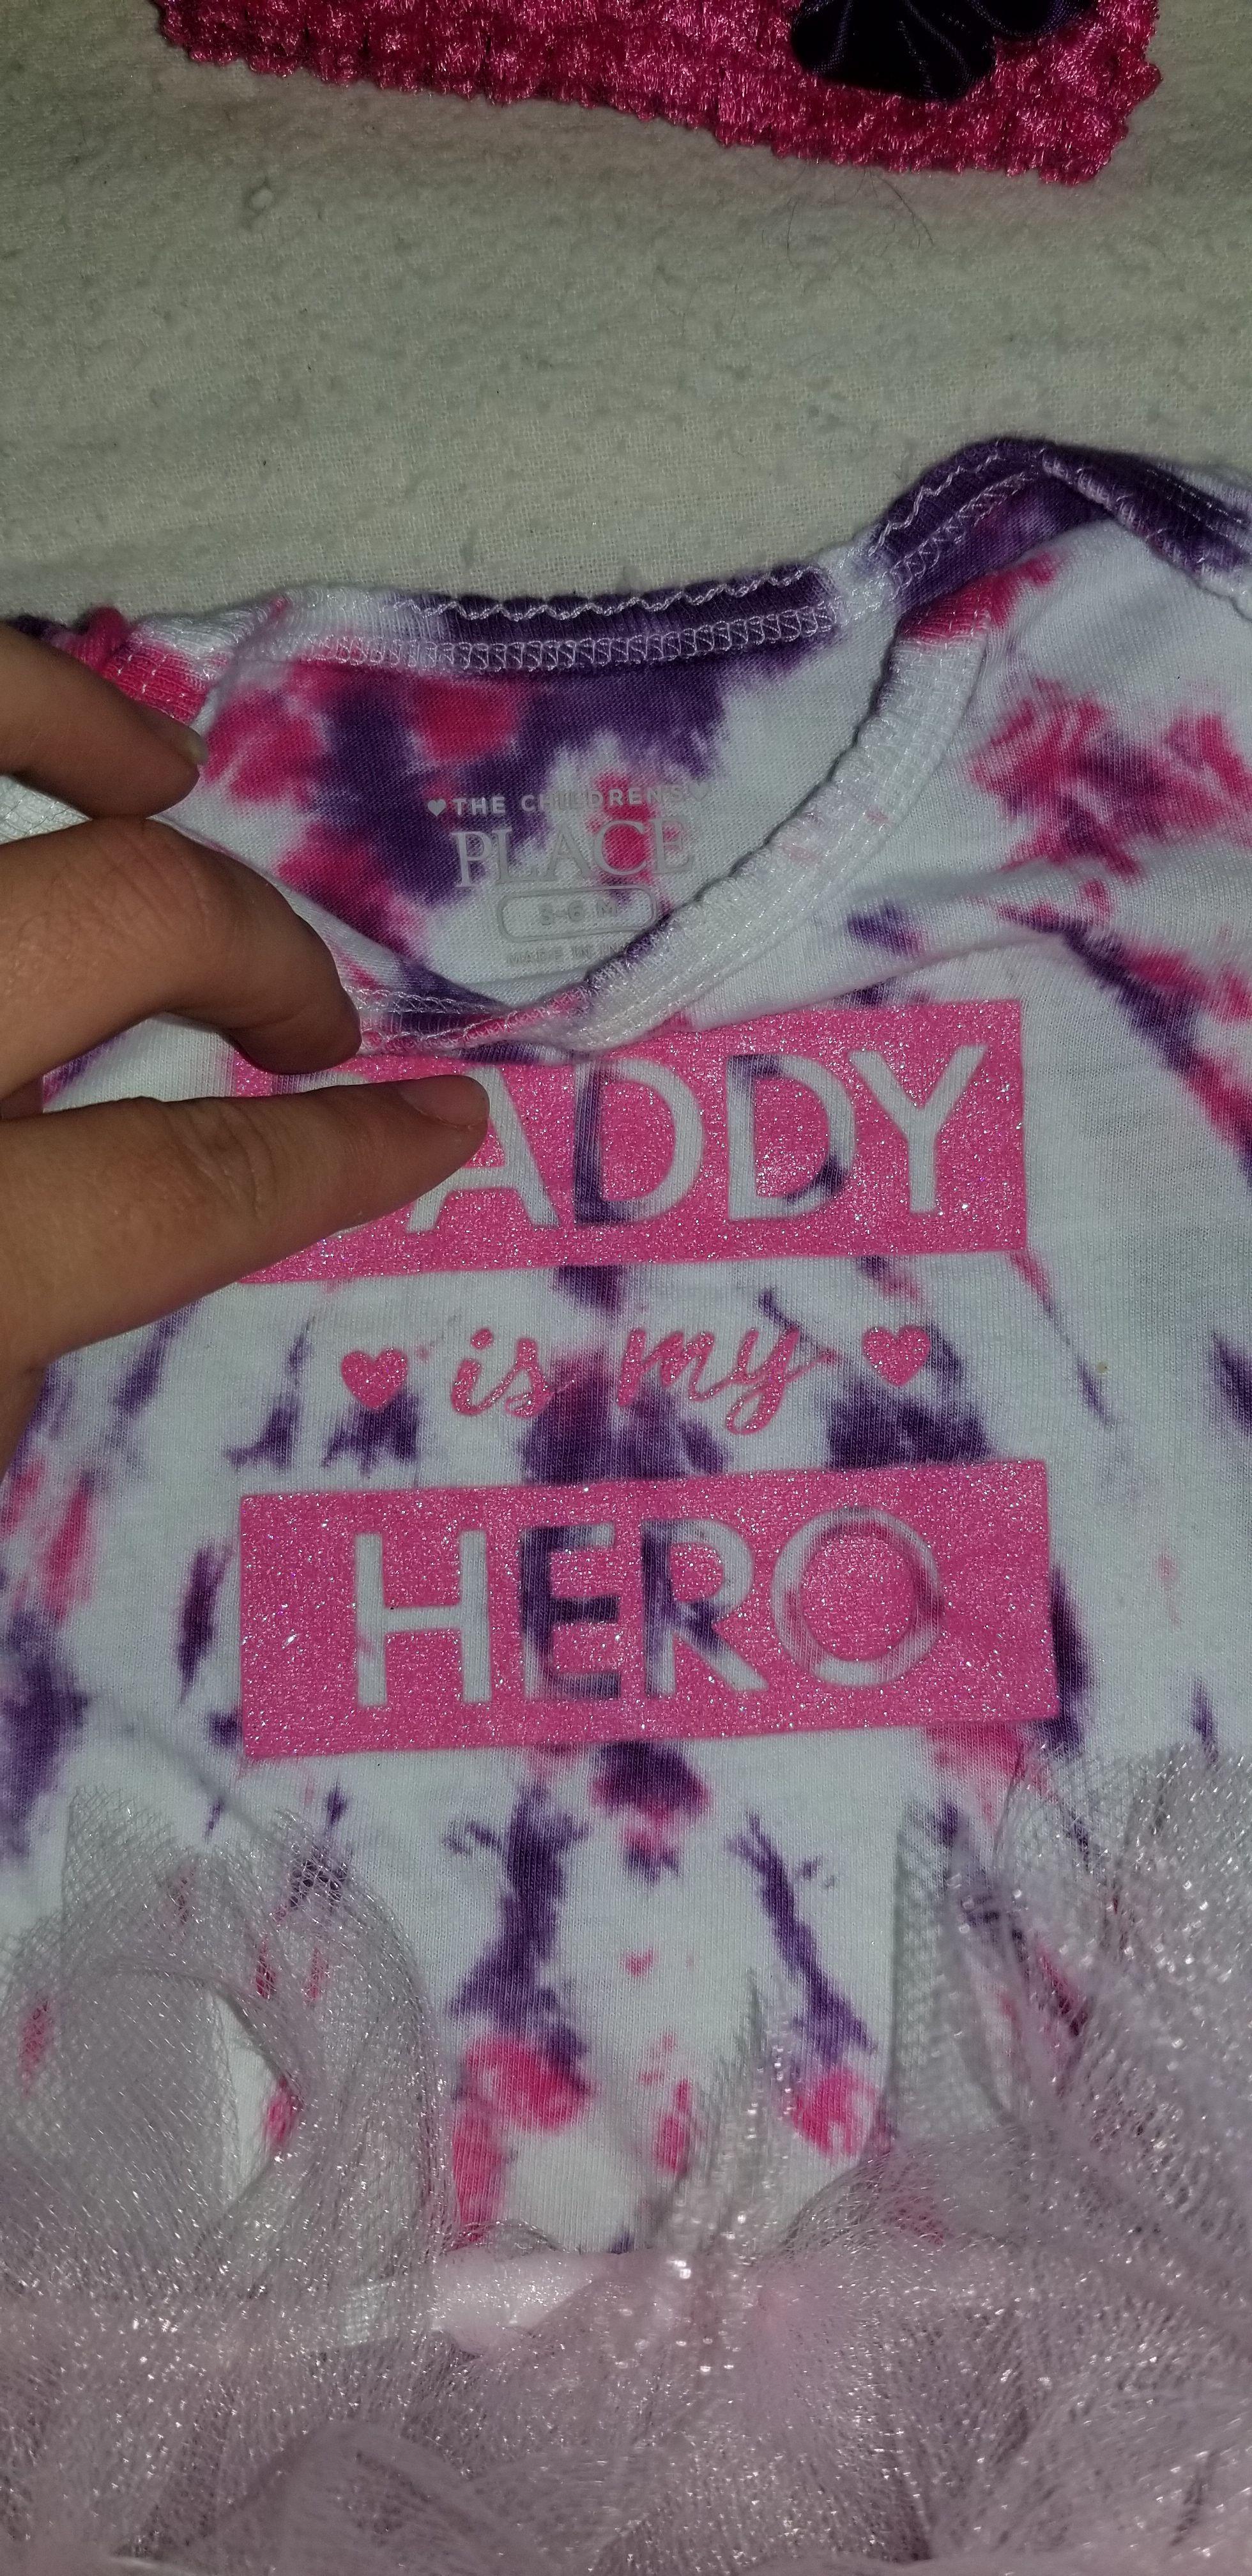 children tutu pink tie place handmade dye purple